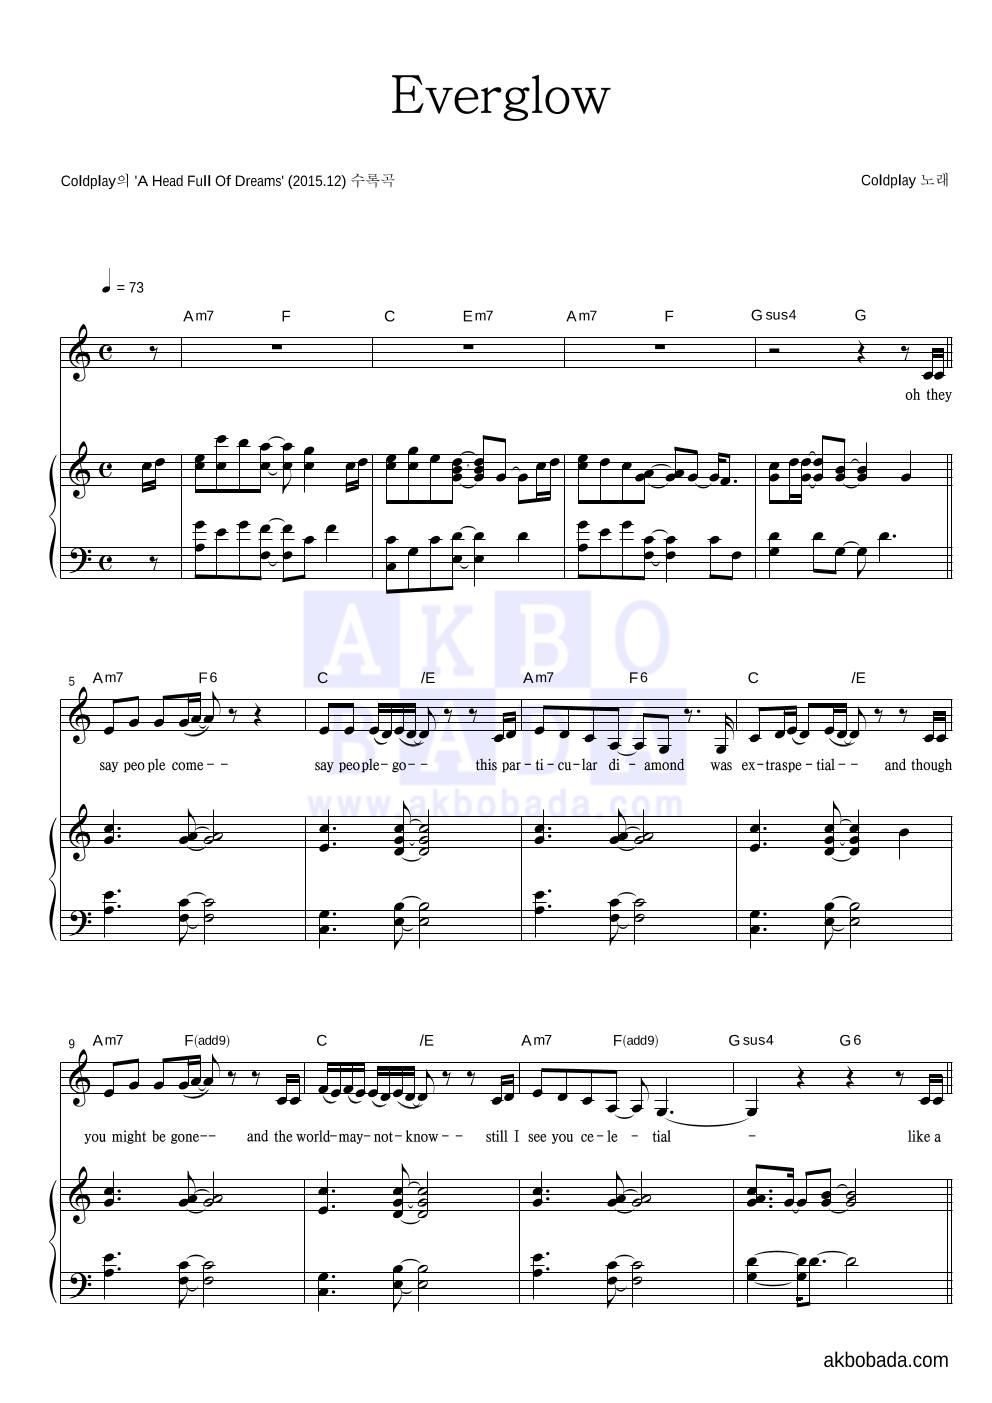 Coldplay - Everglow 멜로디 + 셀피 악보